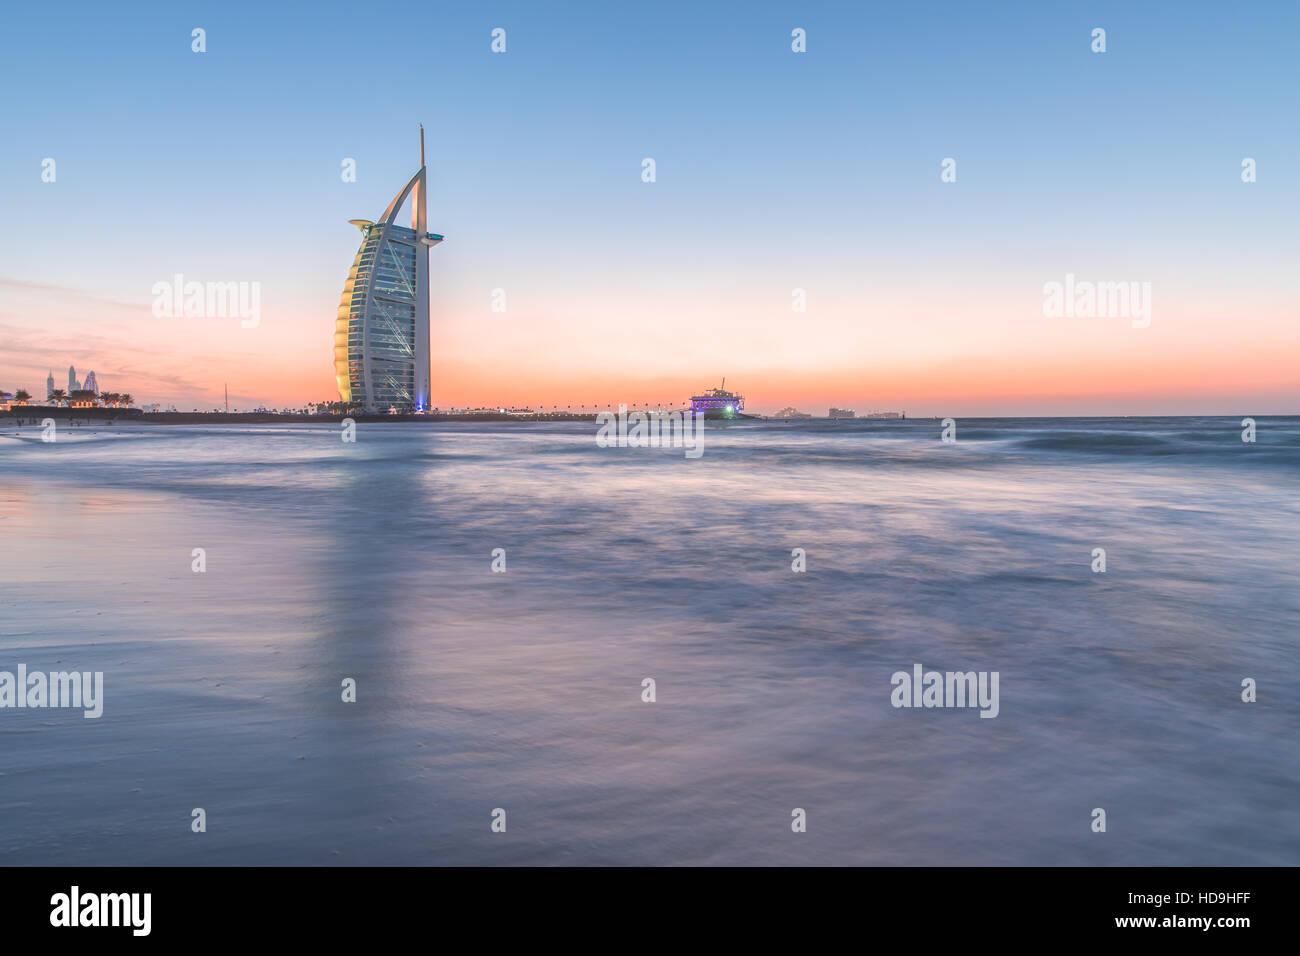 Luxury hotel Burj Al Arab on the coast of Persian Gulf after sunset. Dubai, UAE. - Stock Image